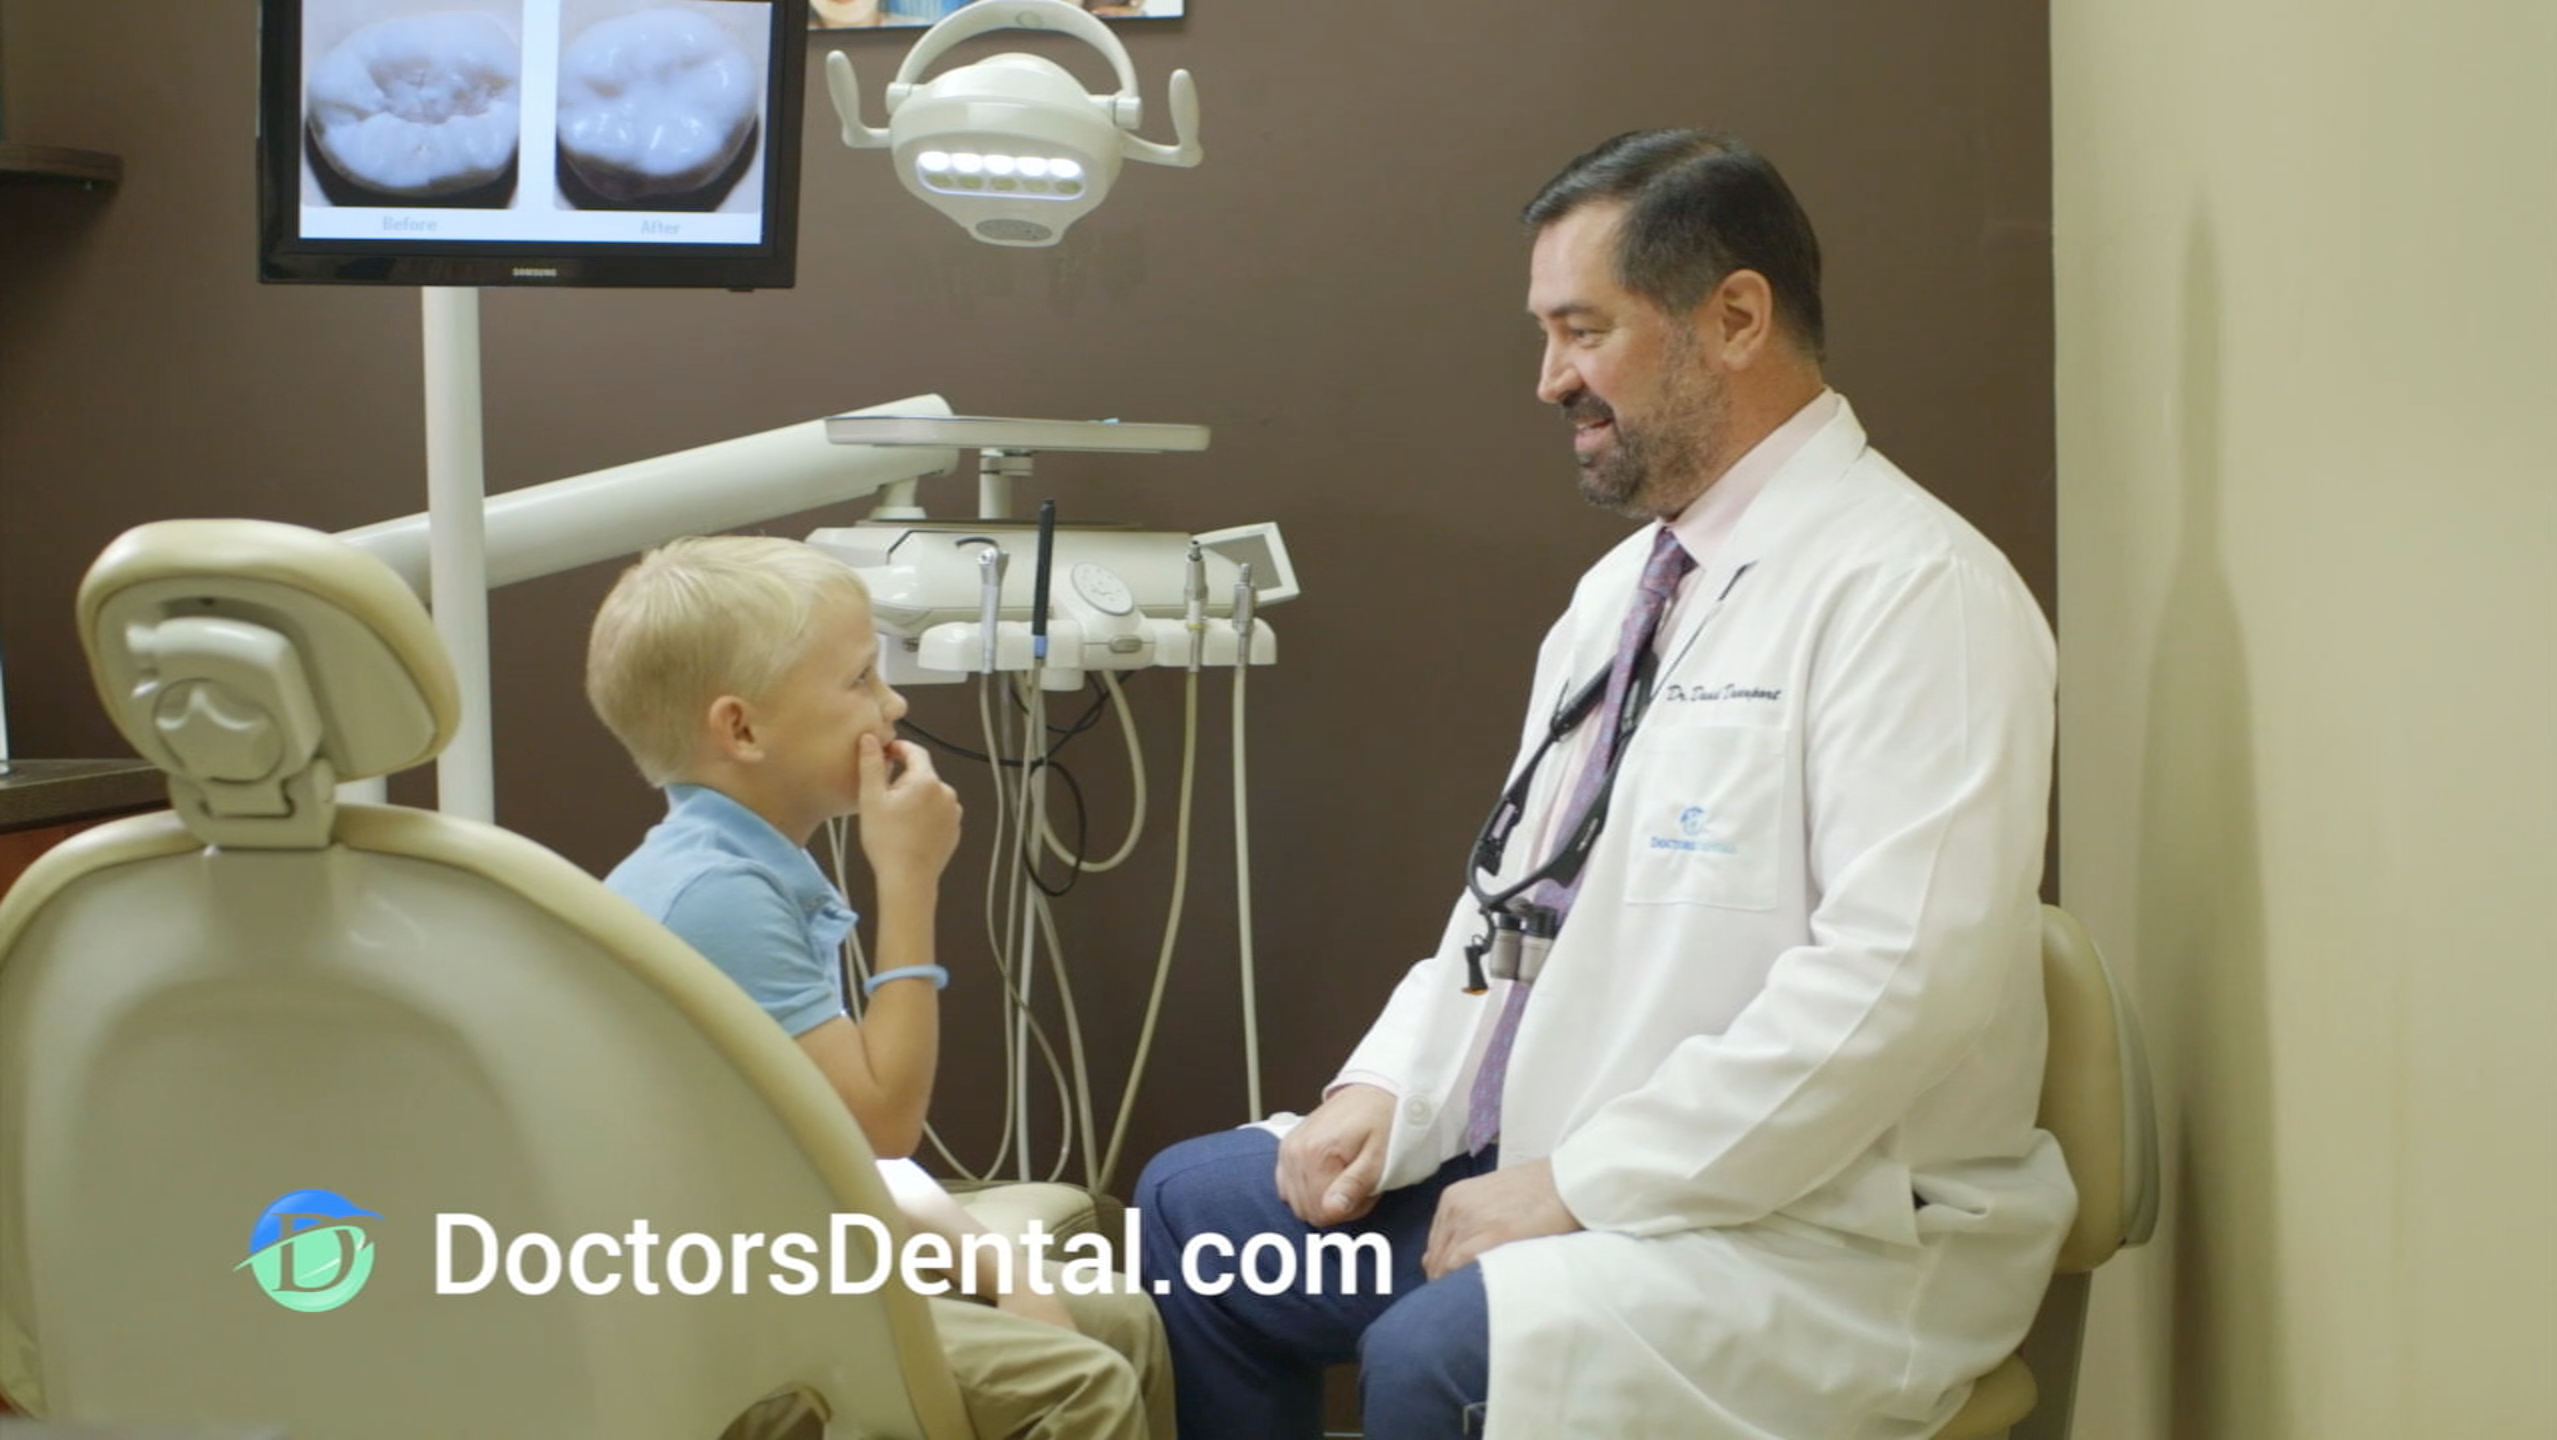 Doctors Dental